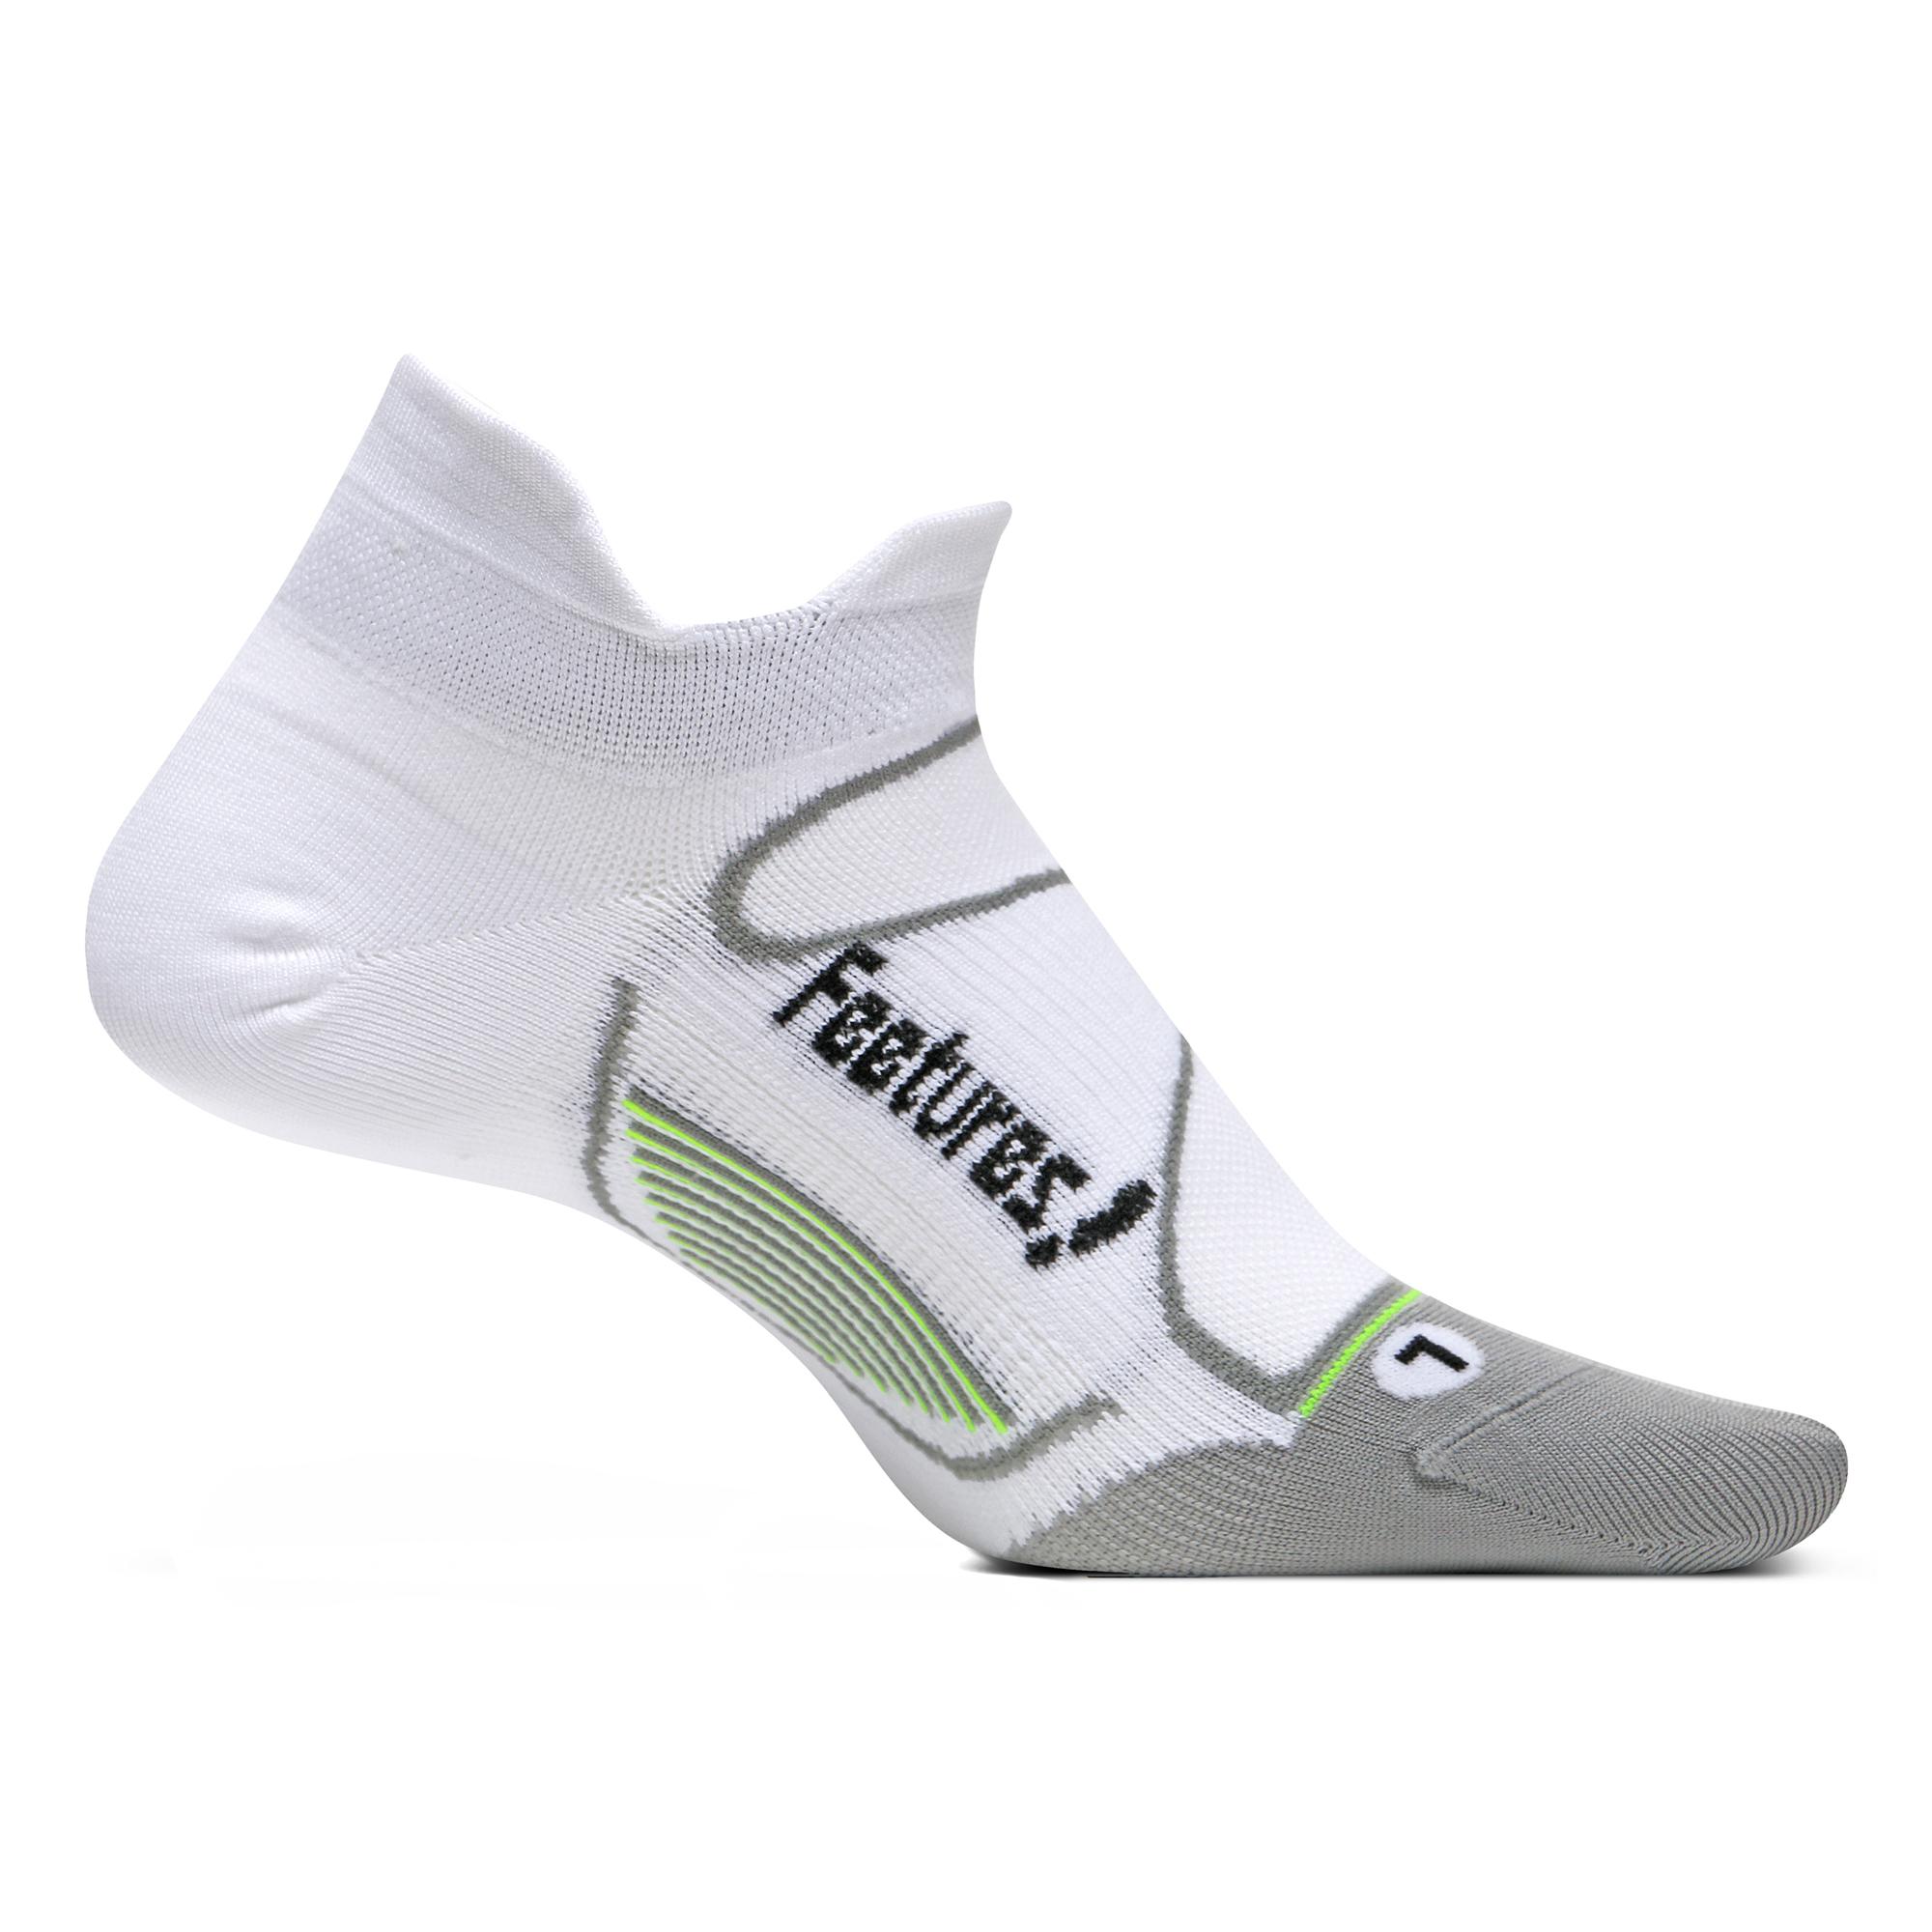 Feetures Elite Ultra Light No Show Tab White/Black Size Larg